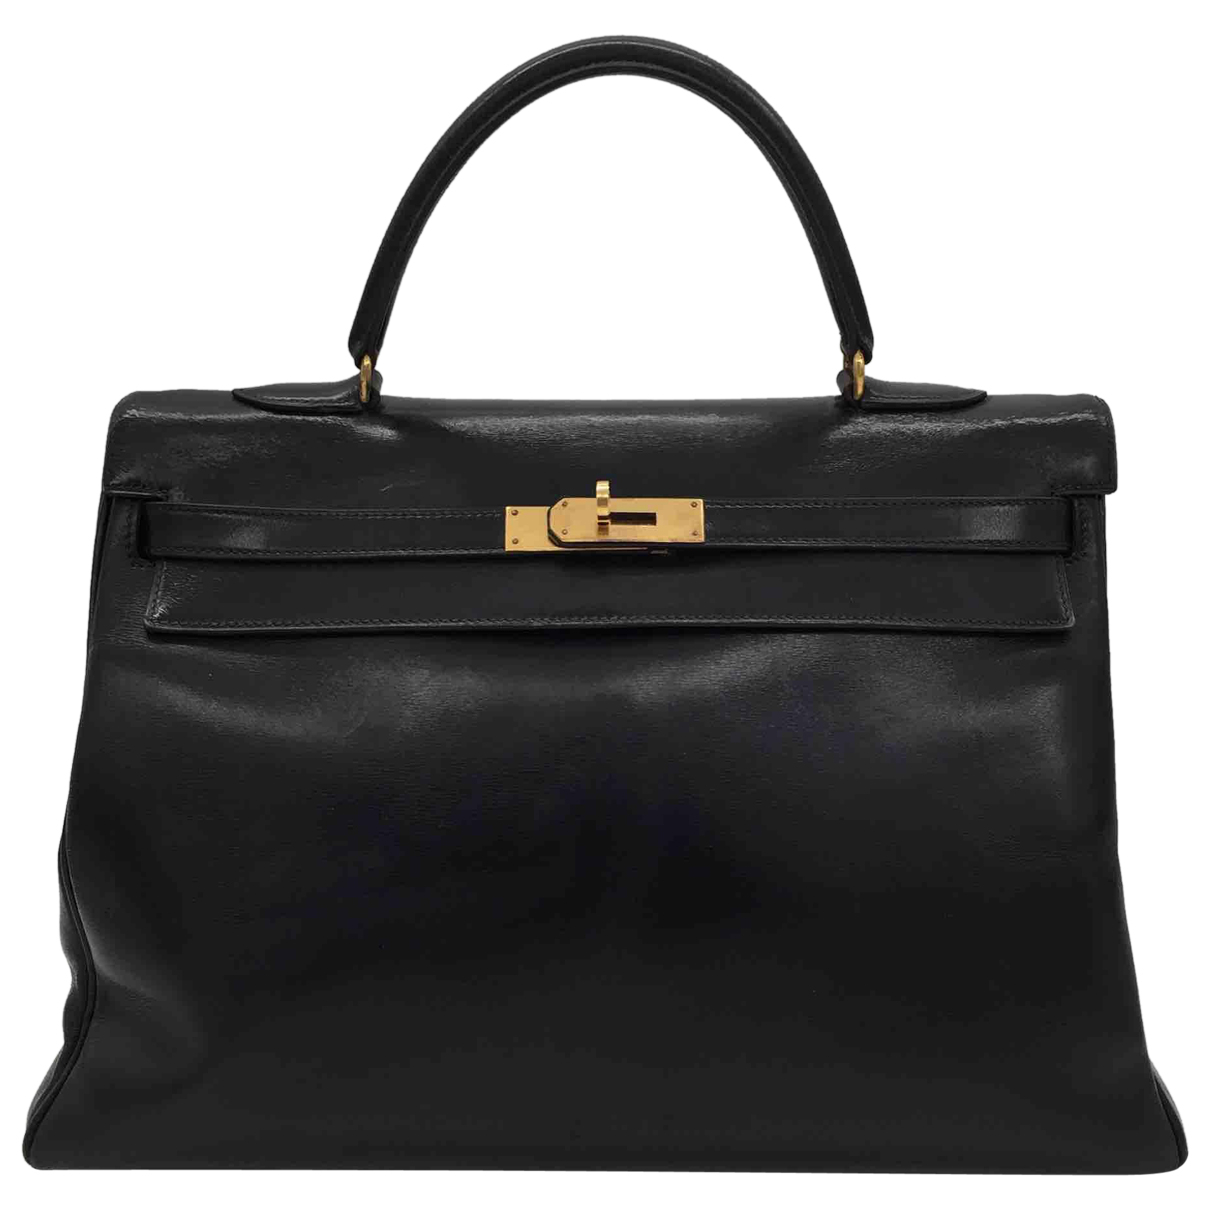 Hermès Kelly 35 Black Leather handbag for Women N